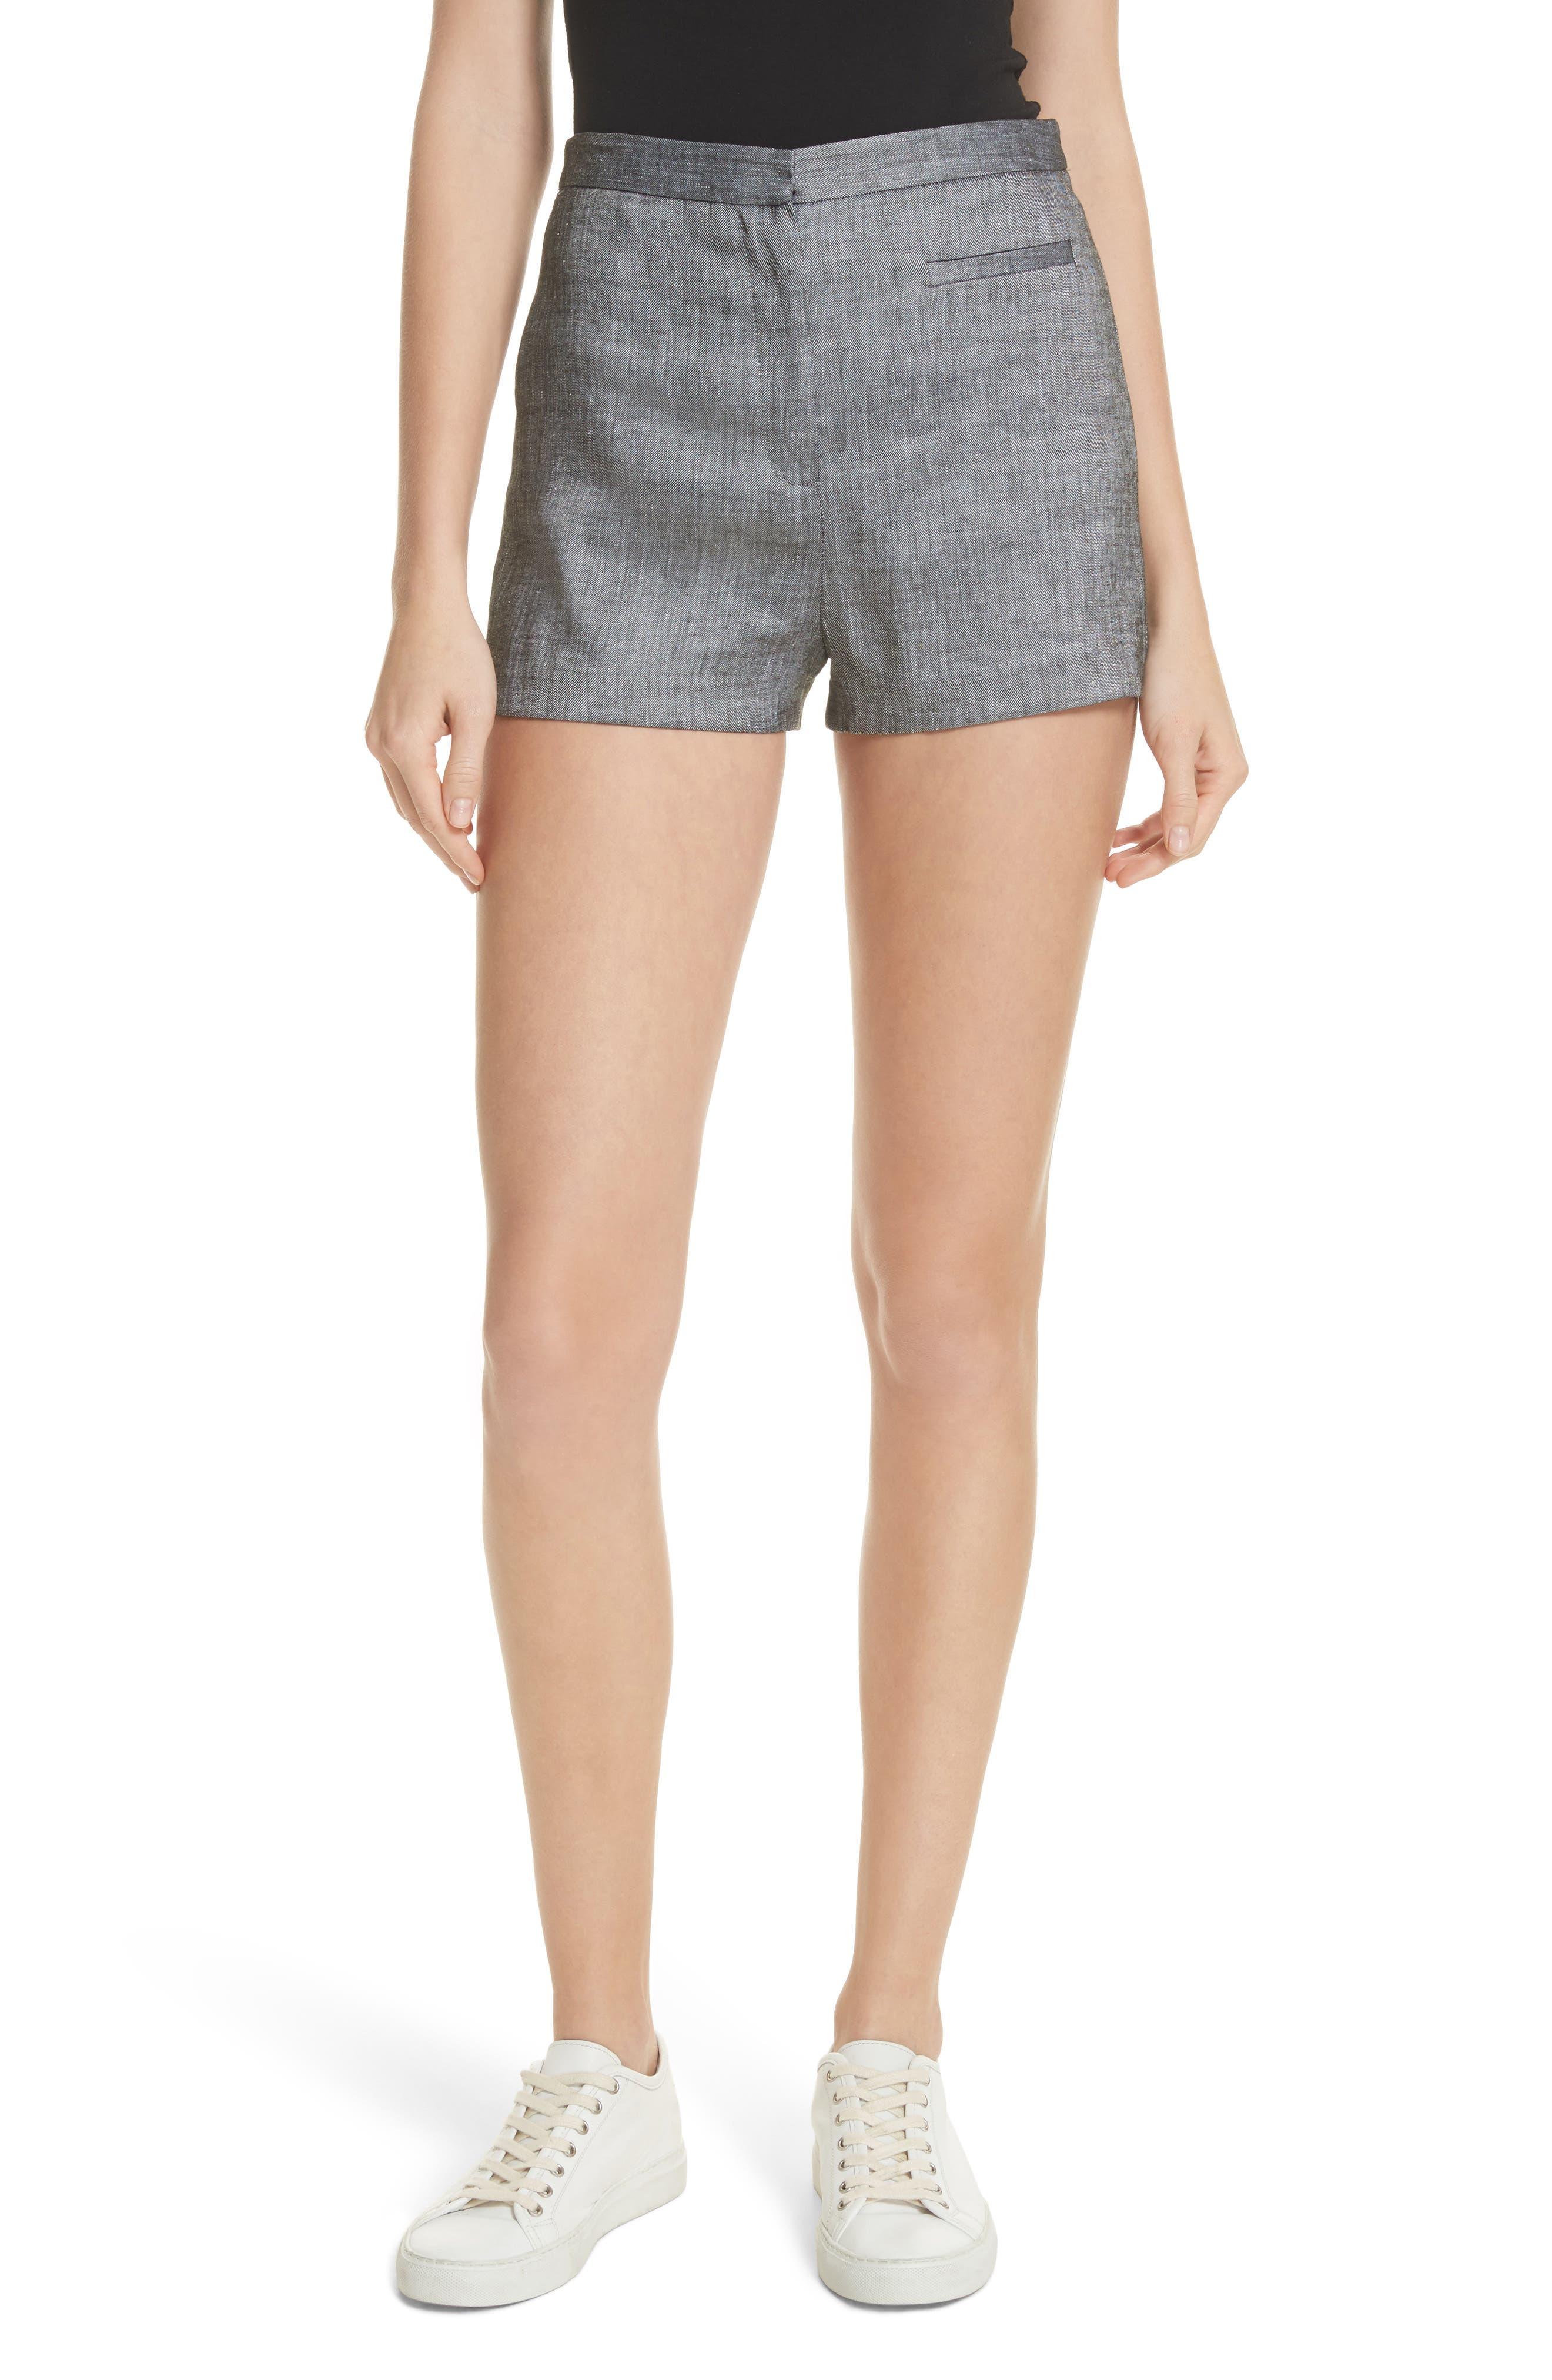 Trudee High Waist Shorts,                             Main thumbnail 1, color,                             309